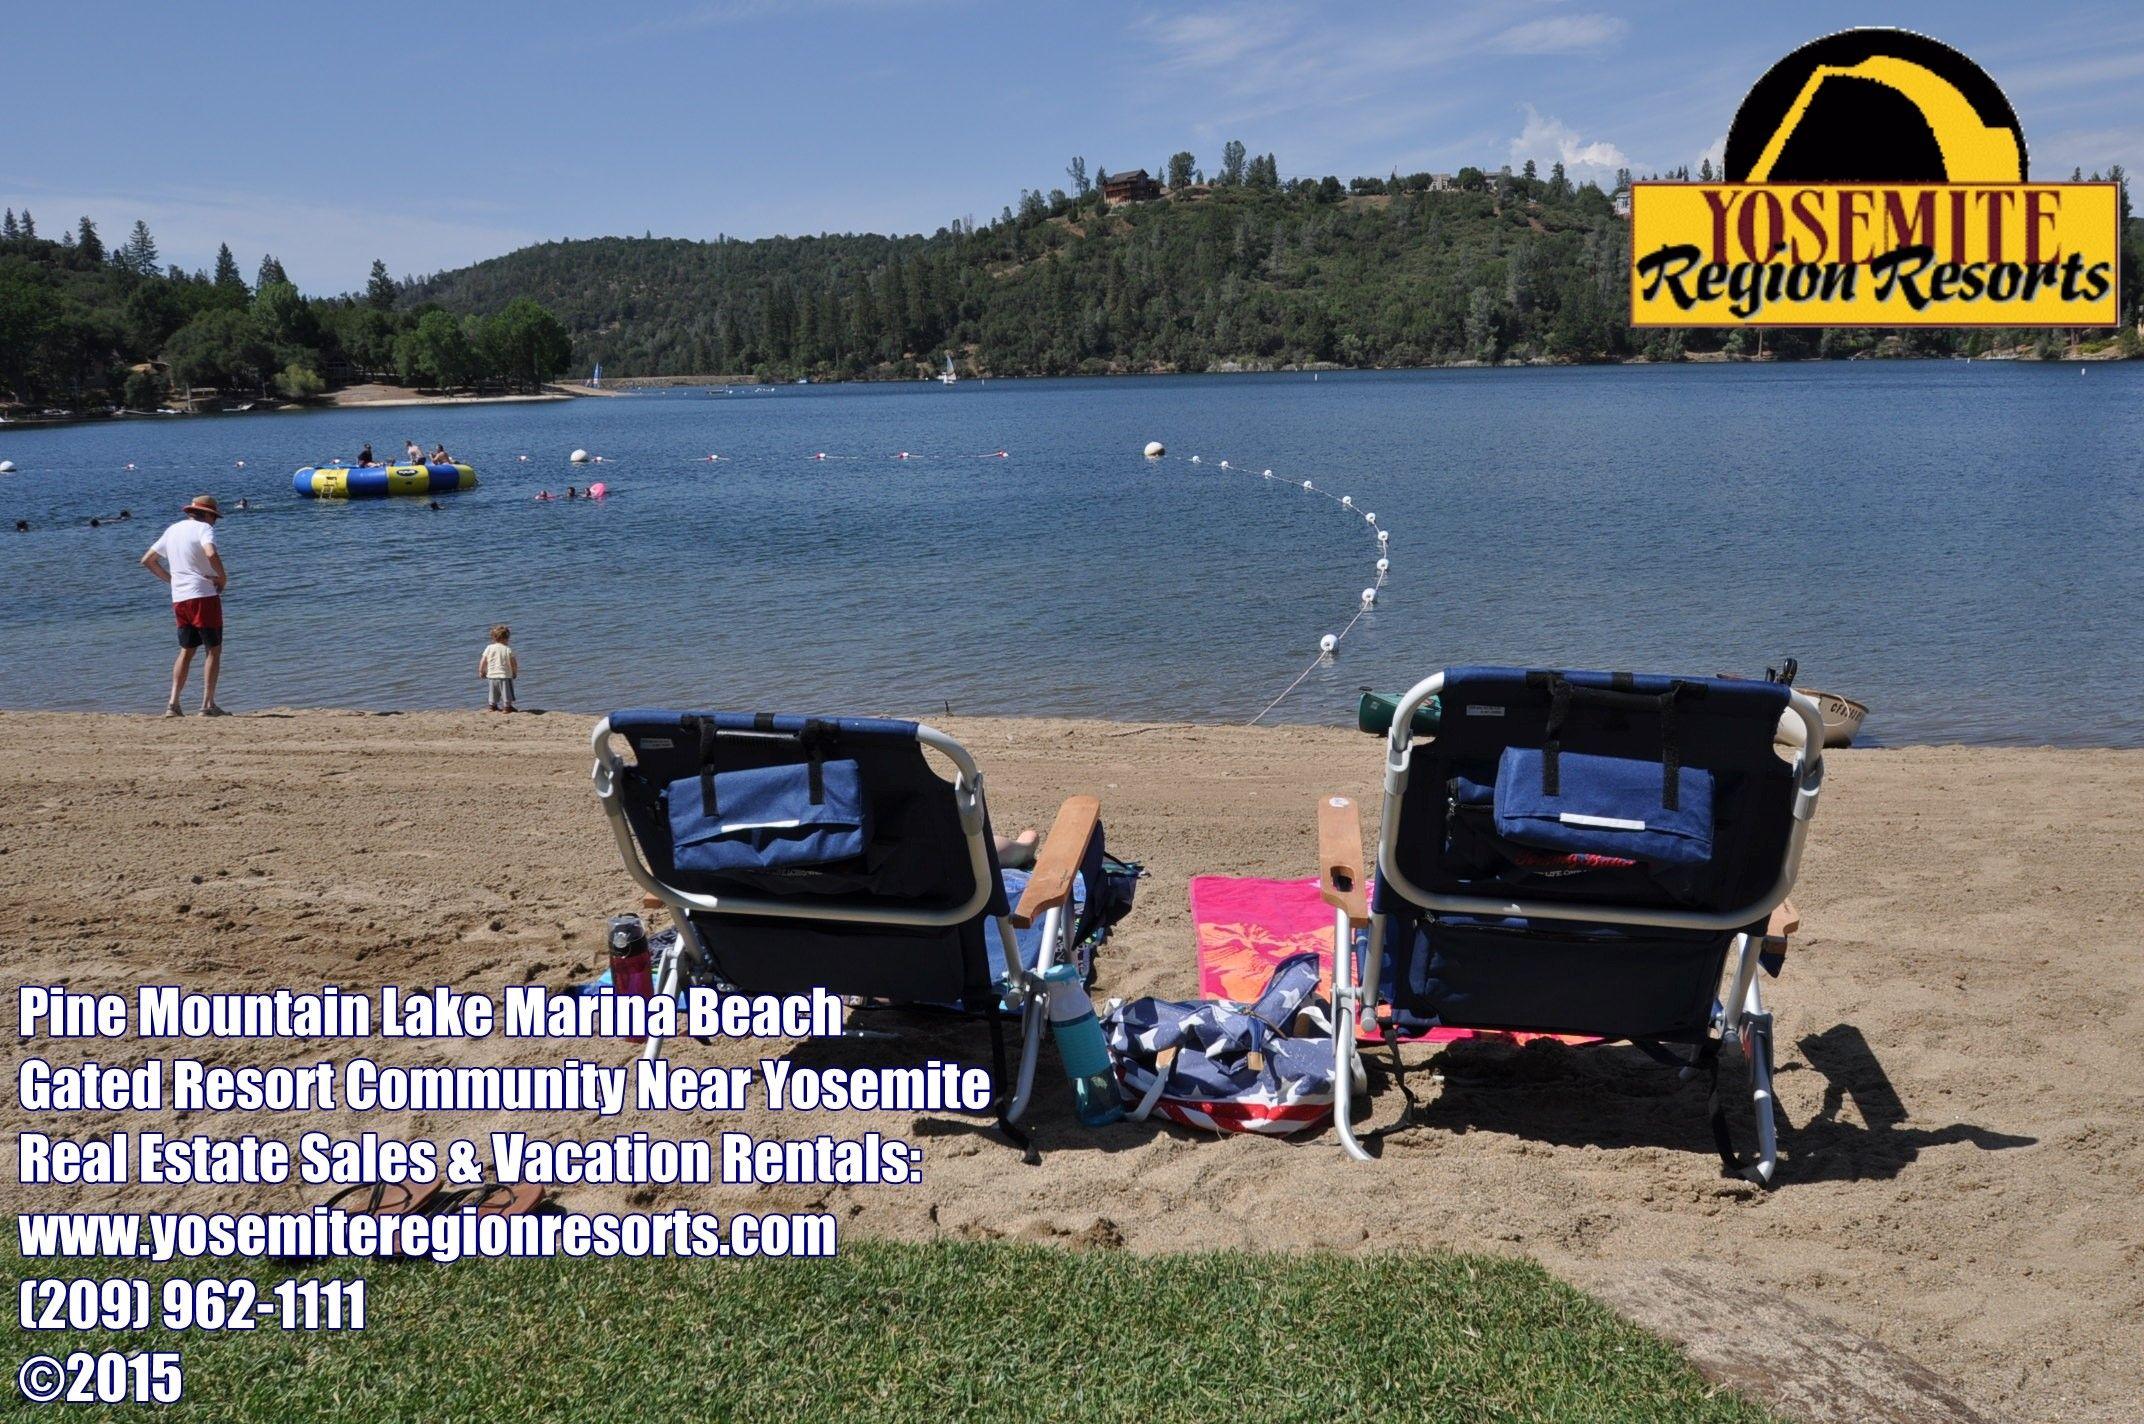 Pine Mountain Lake, near Yosemite, Hwy 120 corridor. Vacation Rentals & Real Estate Sales - Yosemite Region Resorts.